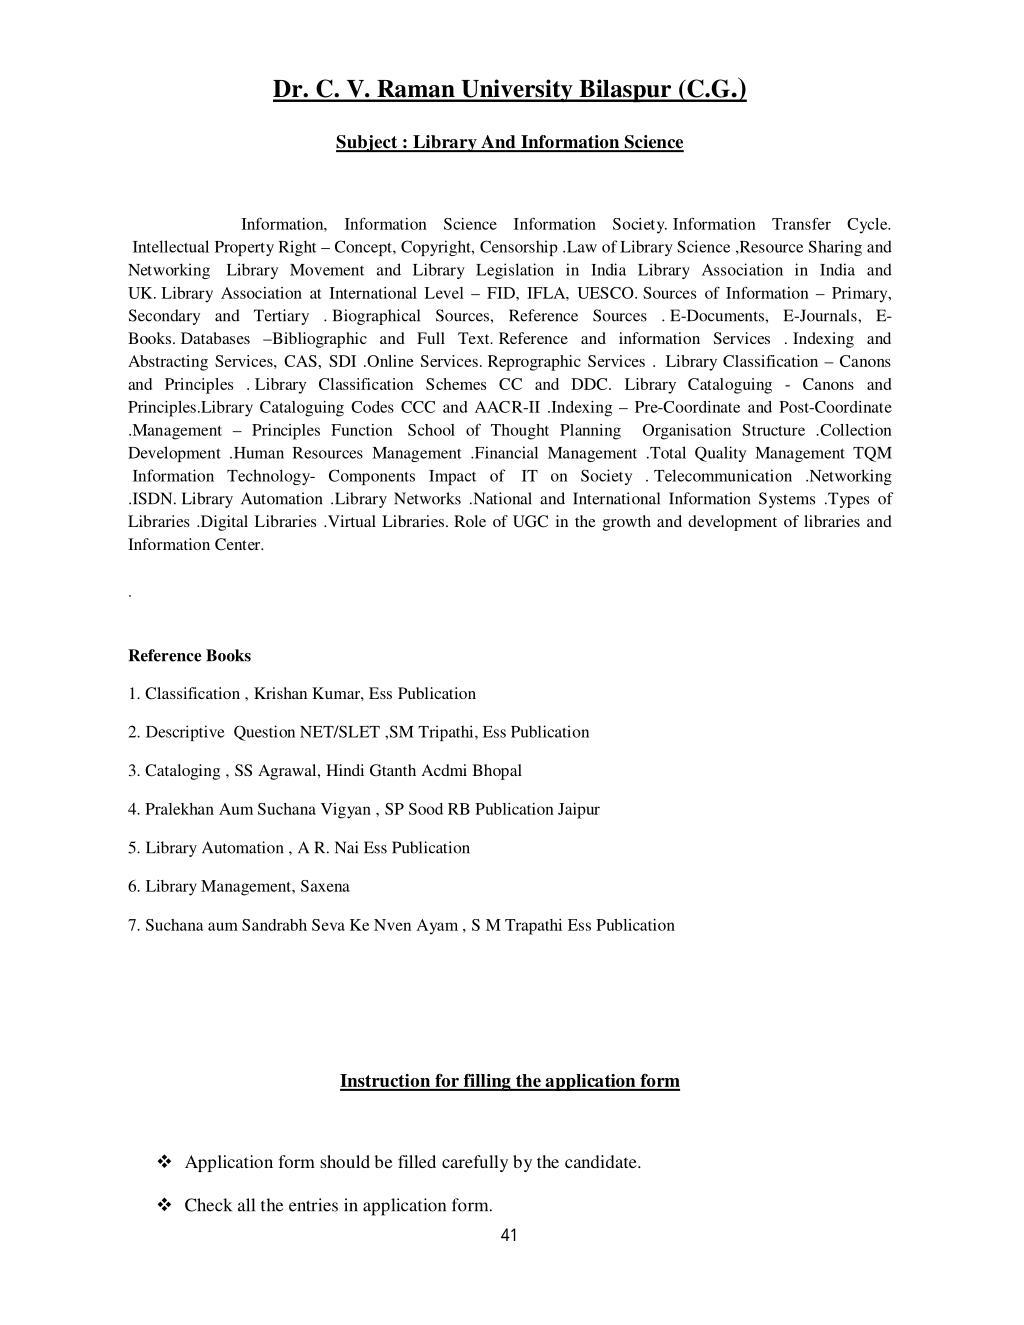 PPT - Mphil Admission Information, Best Private University